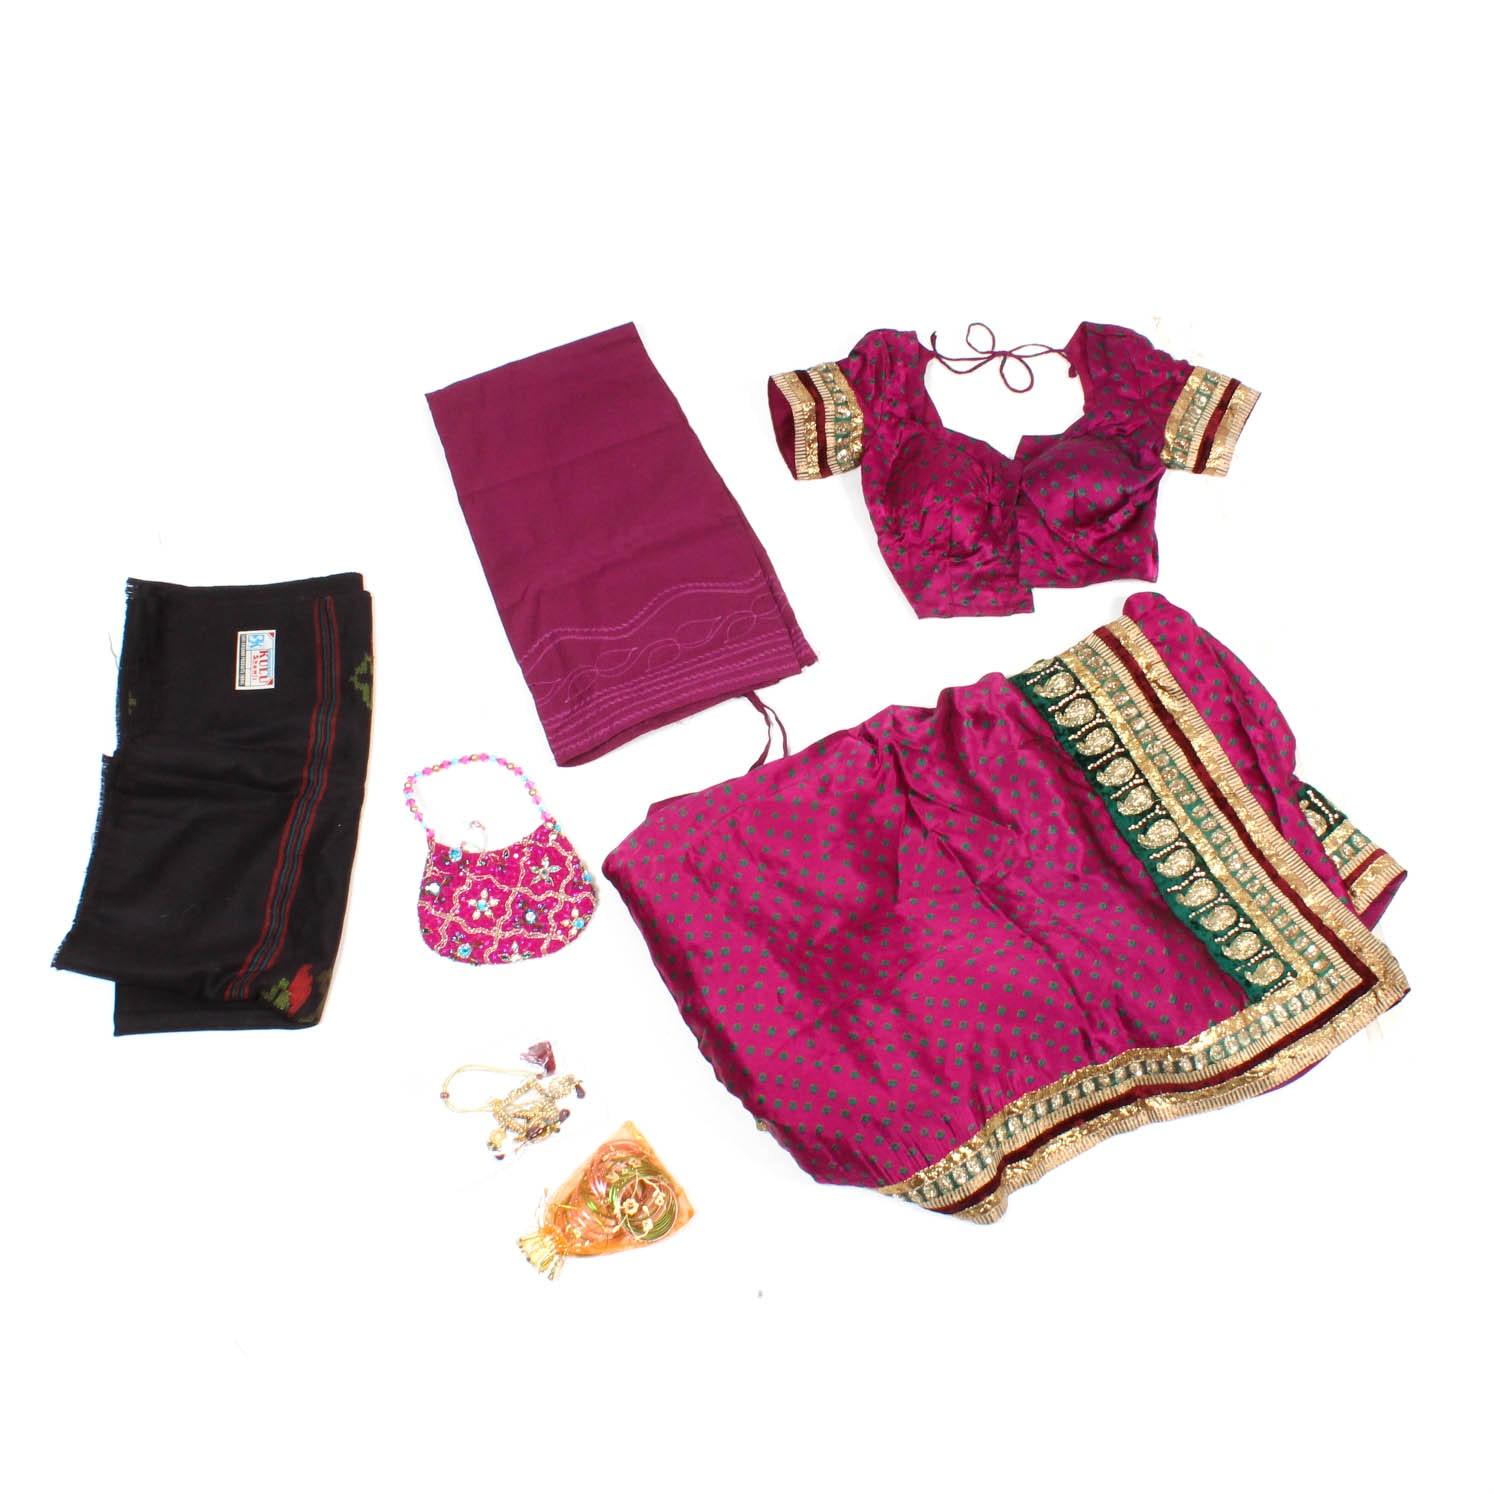 Indian Silk Saree and Wool Shawl